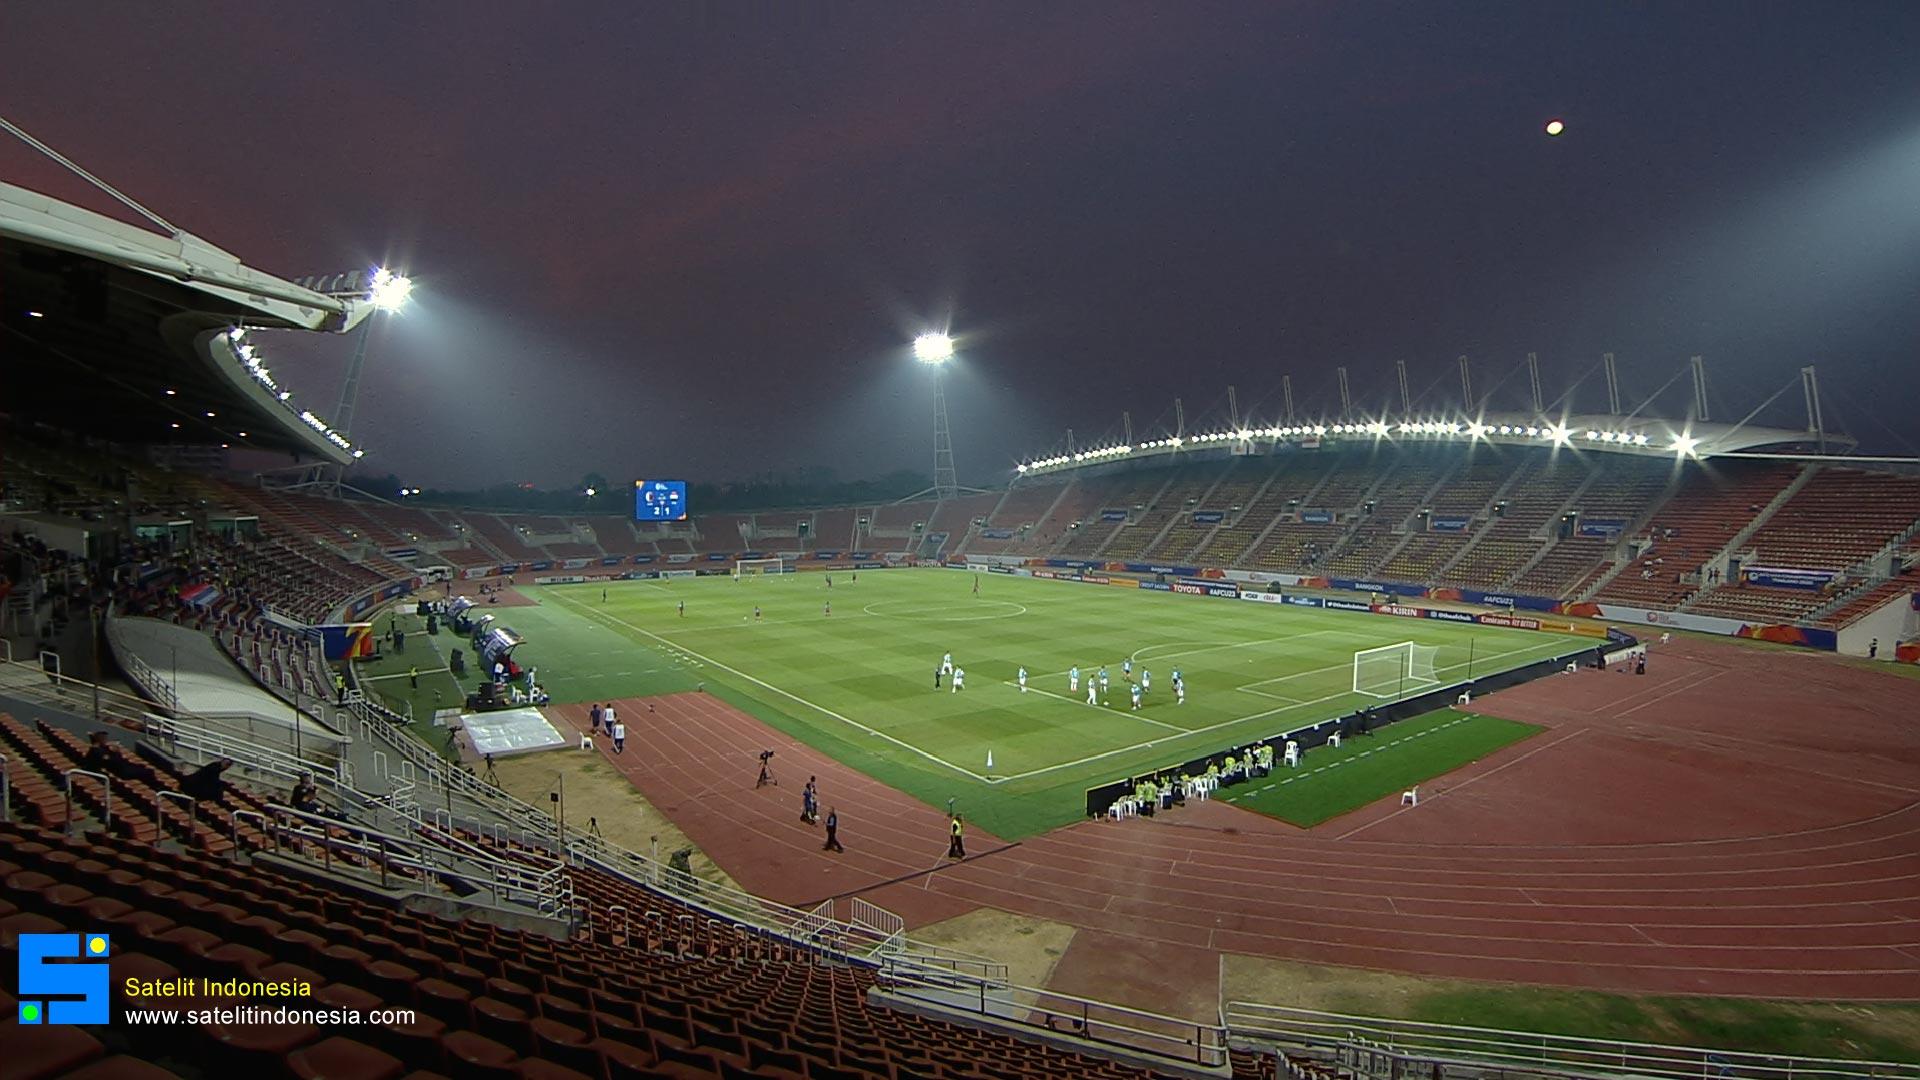 Frekuensi siaran AFC U23 Championship 2020 di satelit AsiaSat 5 Terbaru